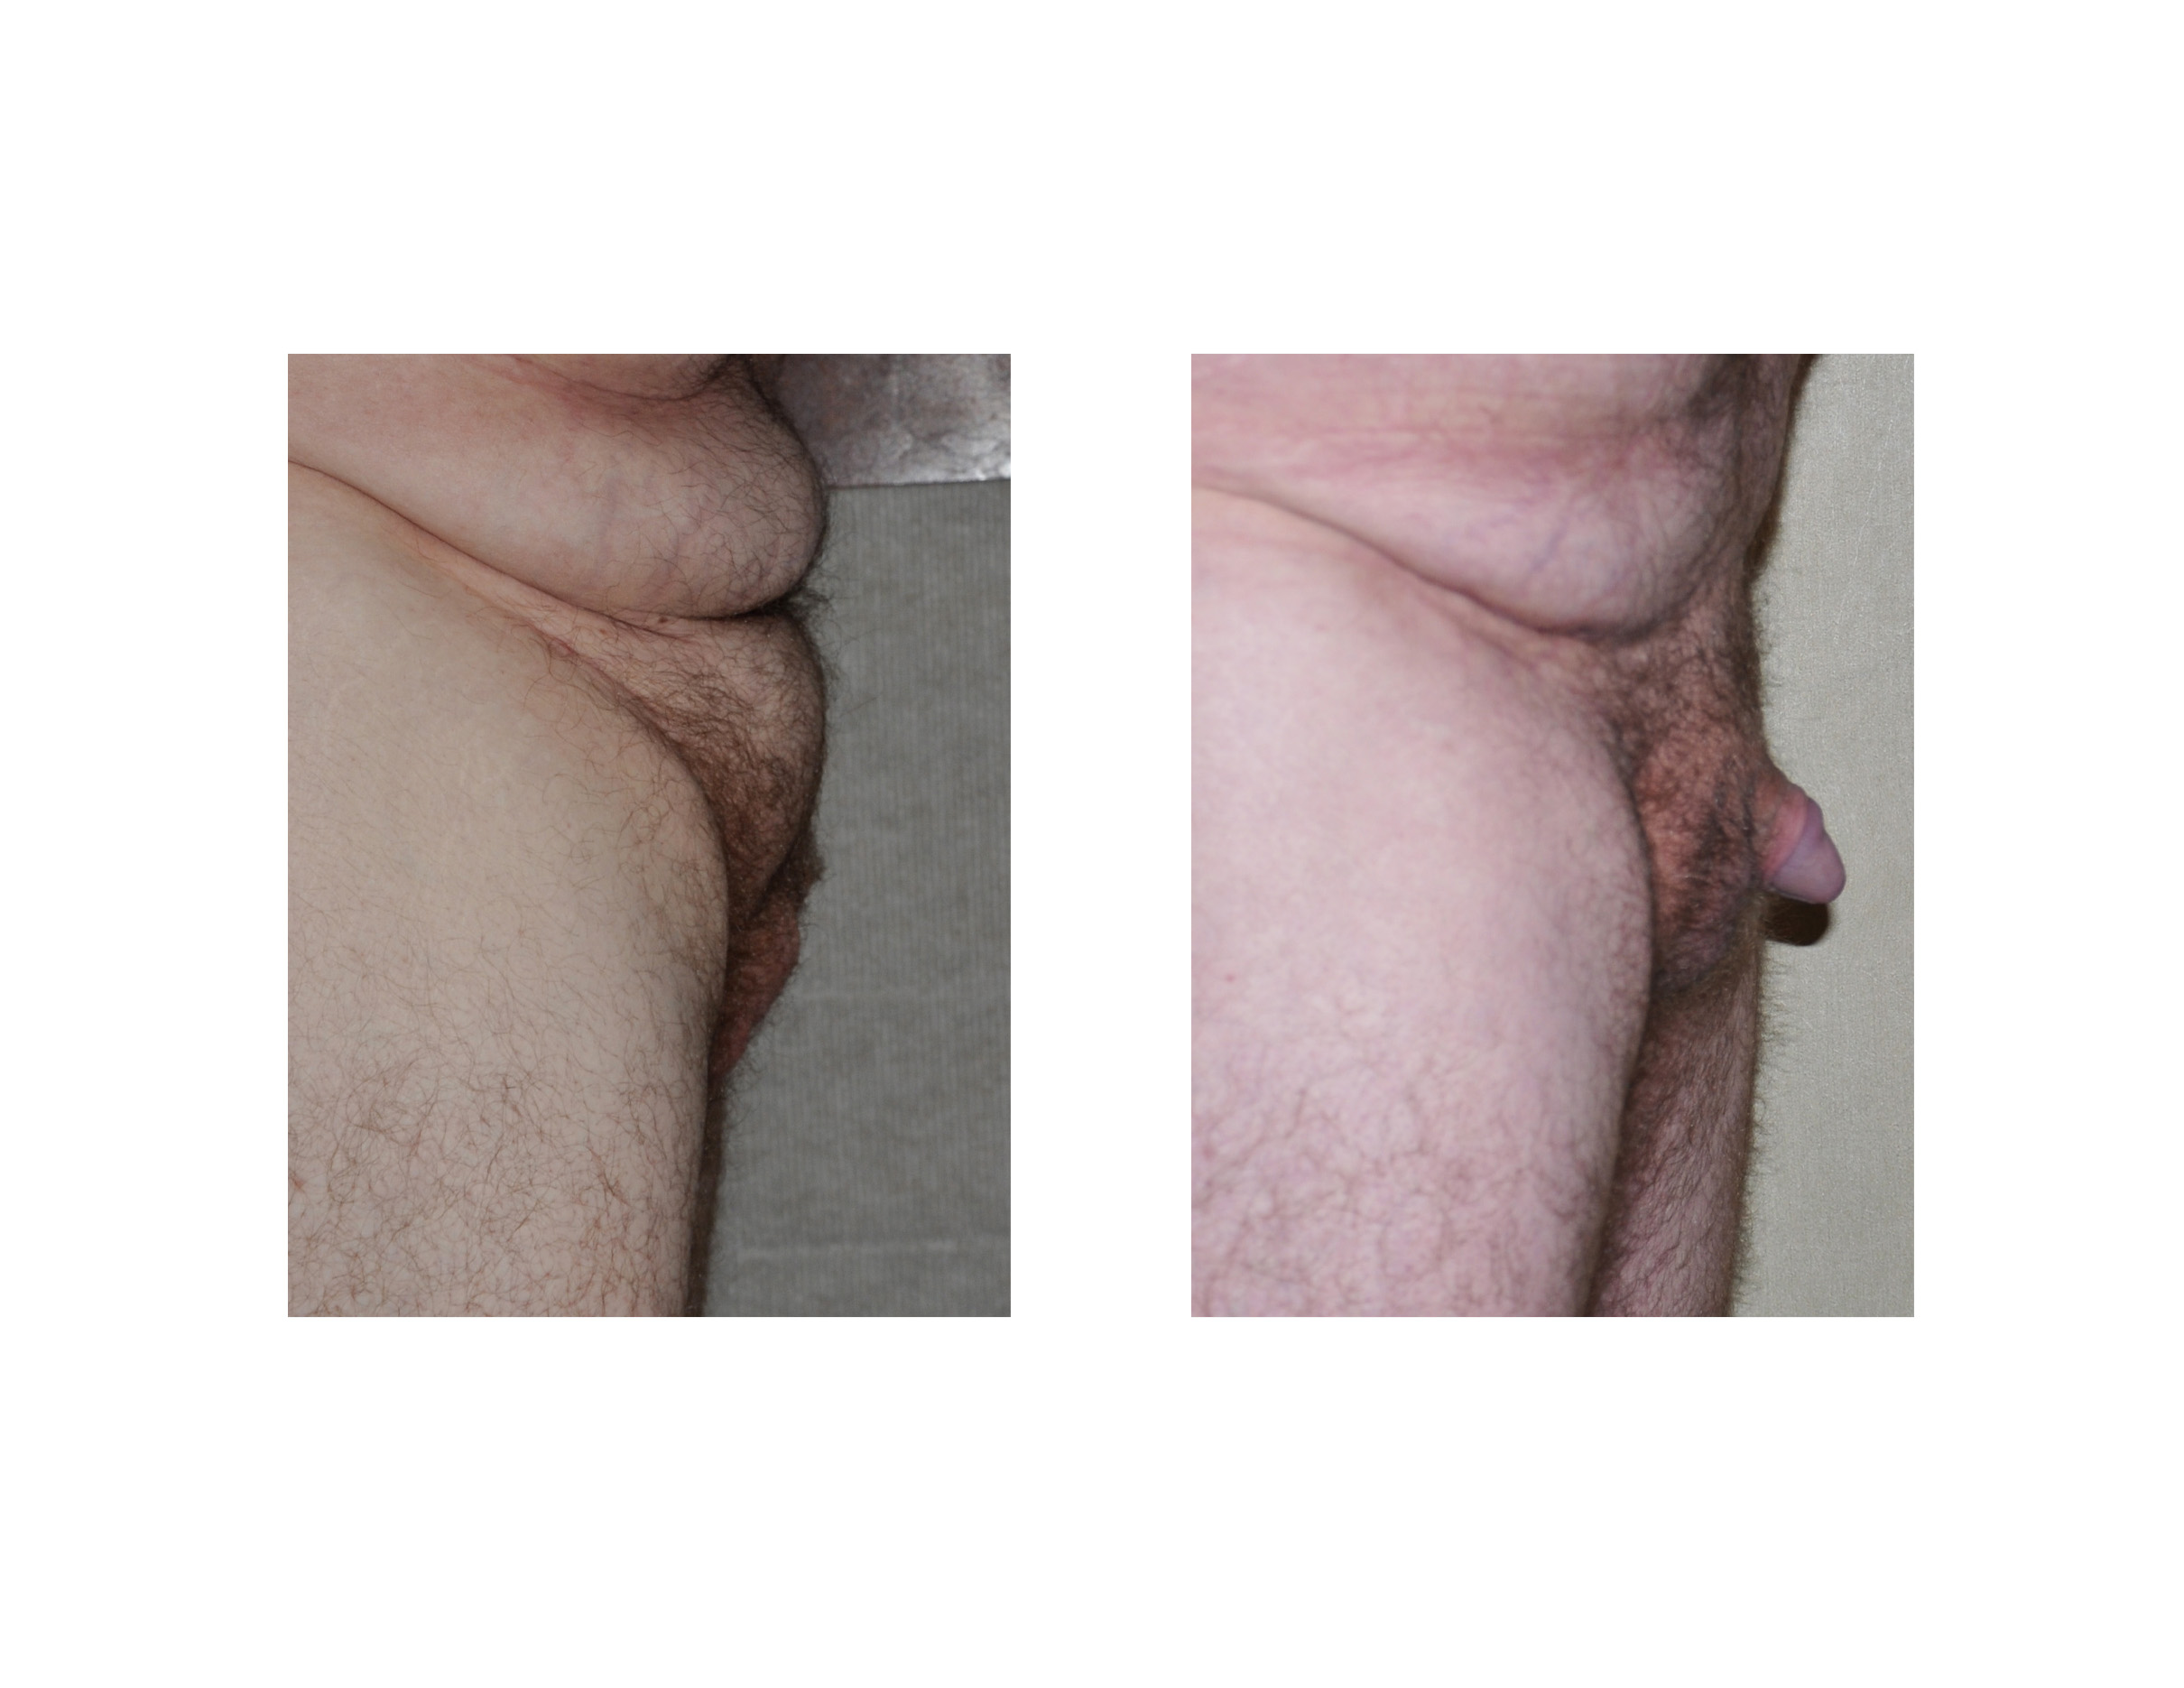 Buried penis problem buried penis treatment explained